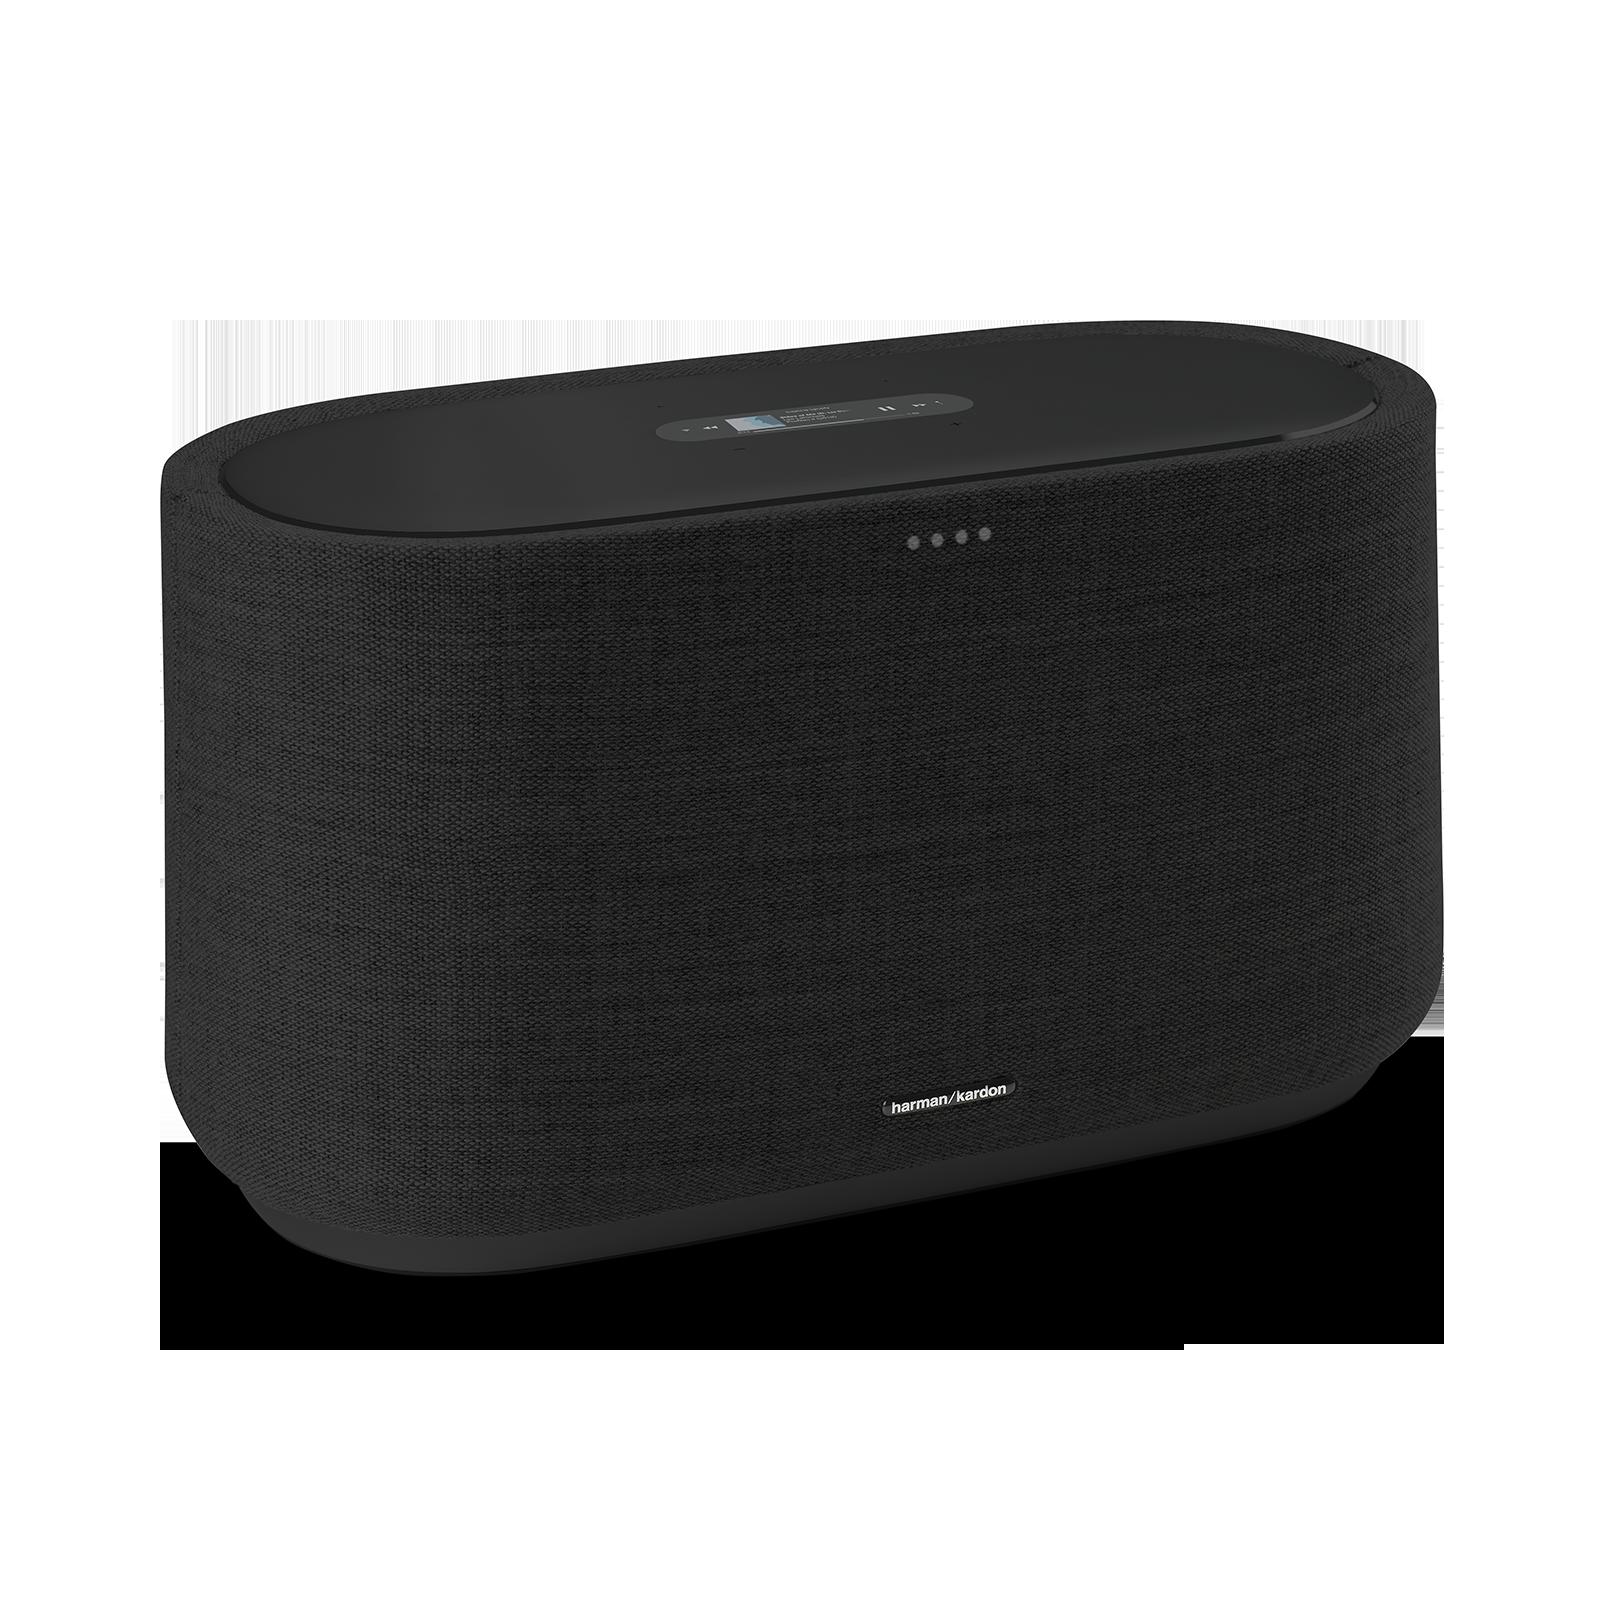 Harman Kardon Citation 500 - Black - Large Tabletop Smart Home Loudspeaker System - Hero